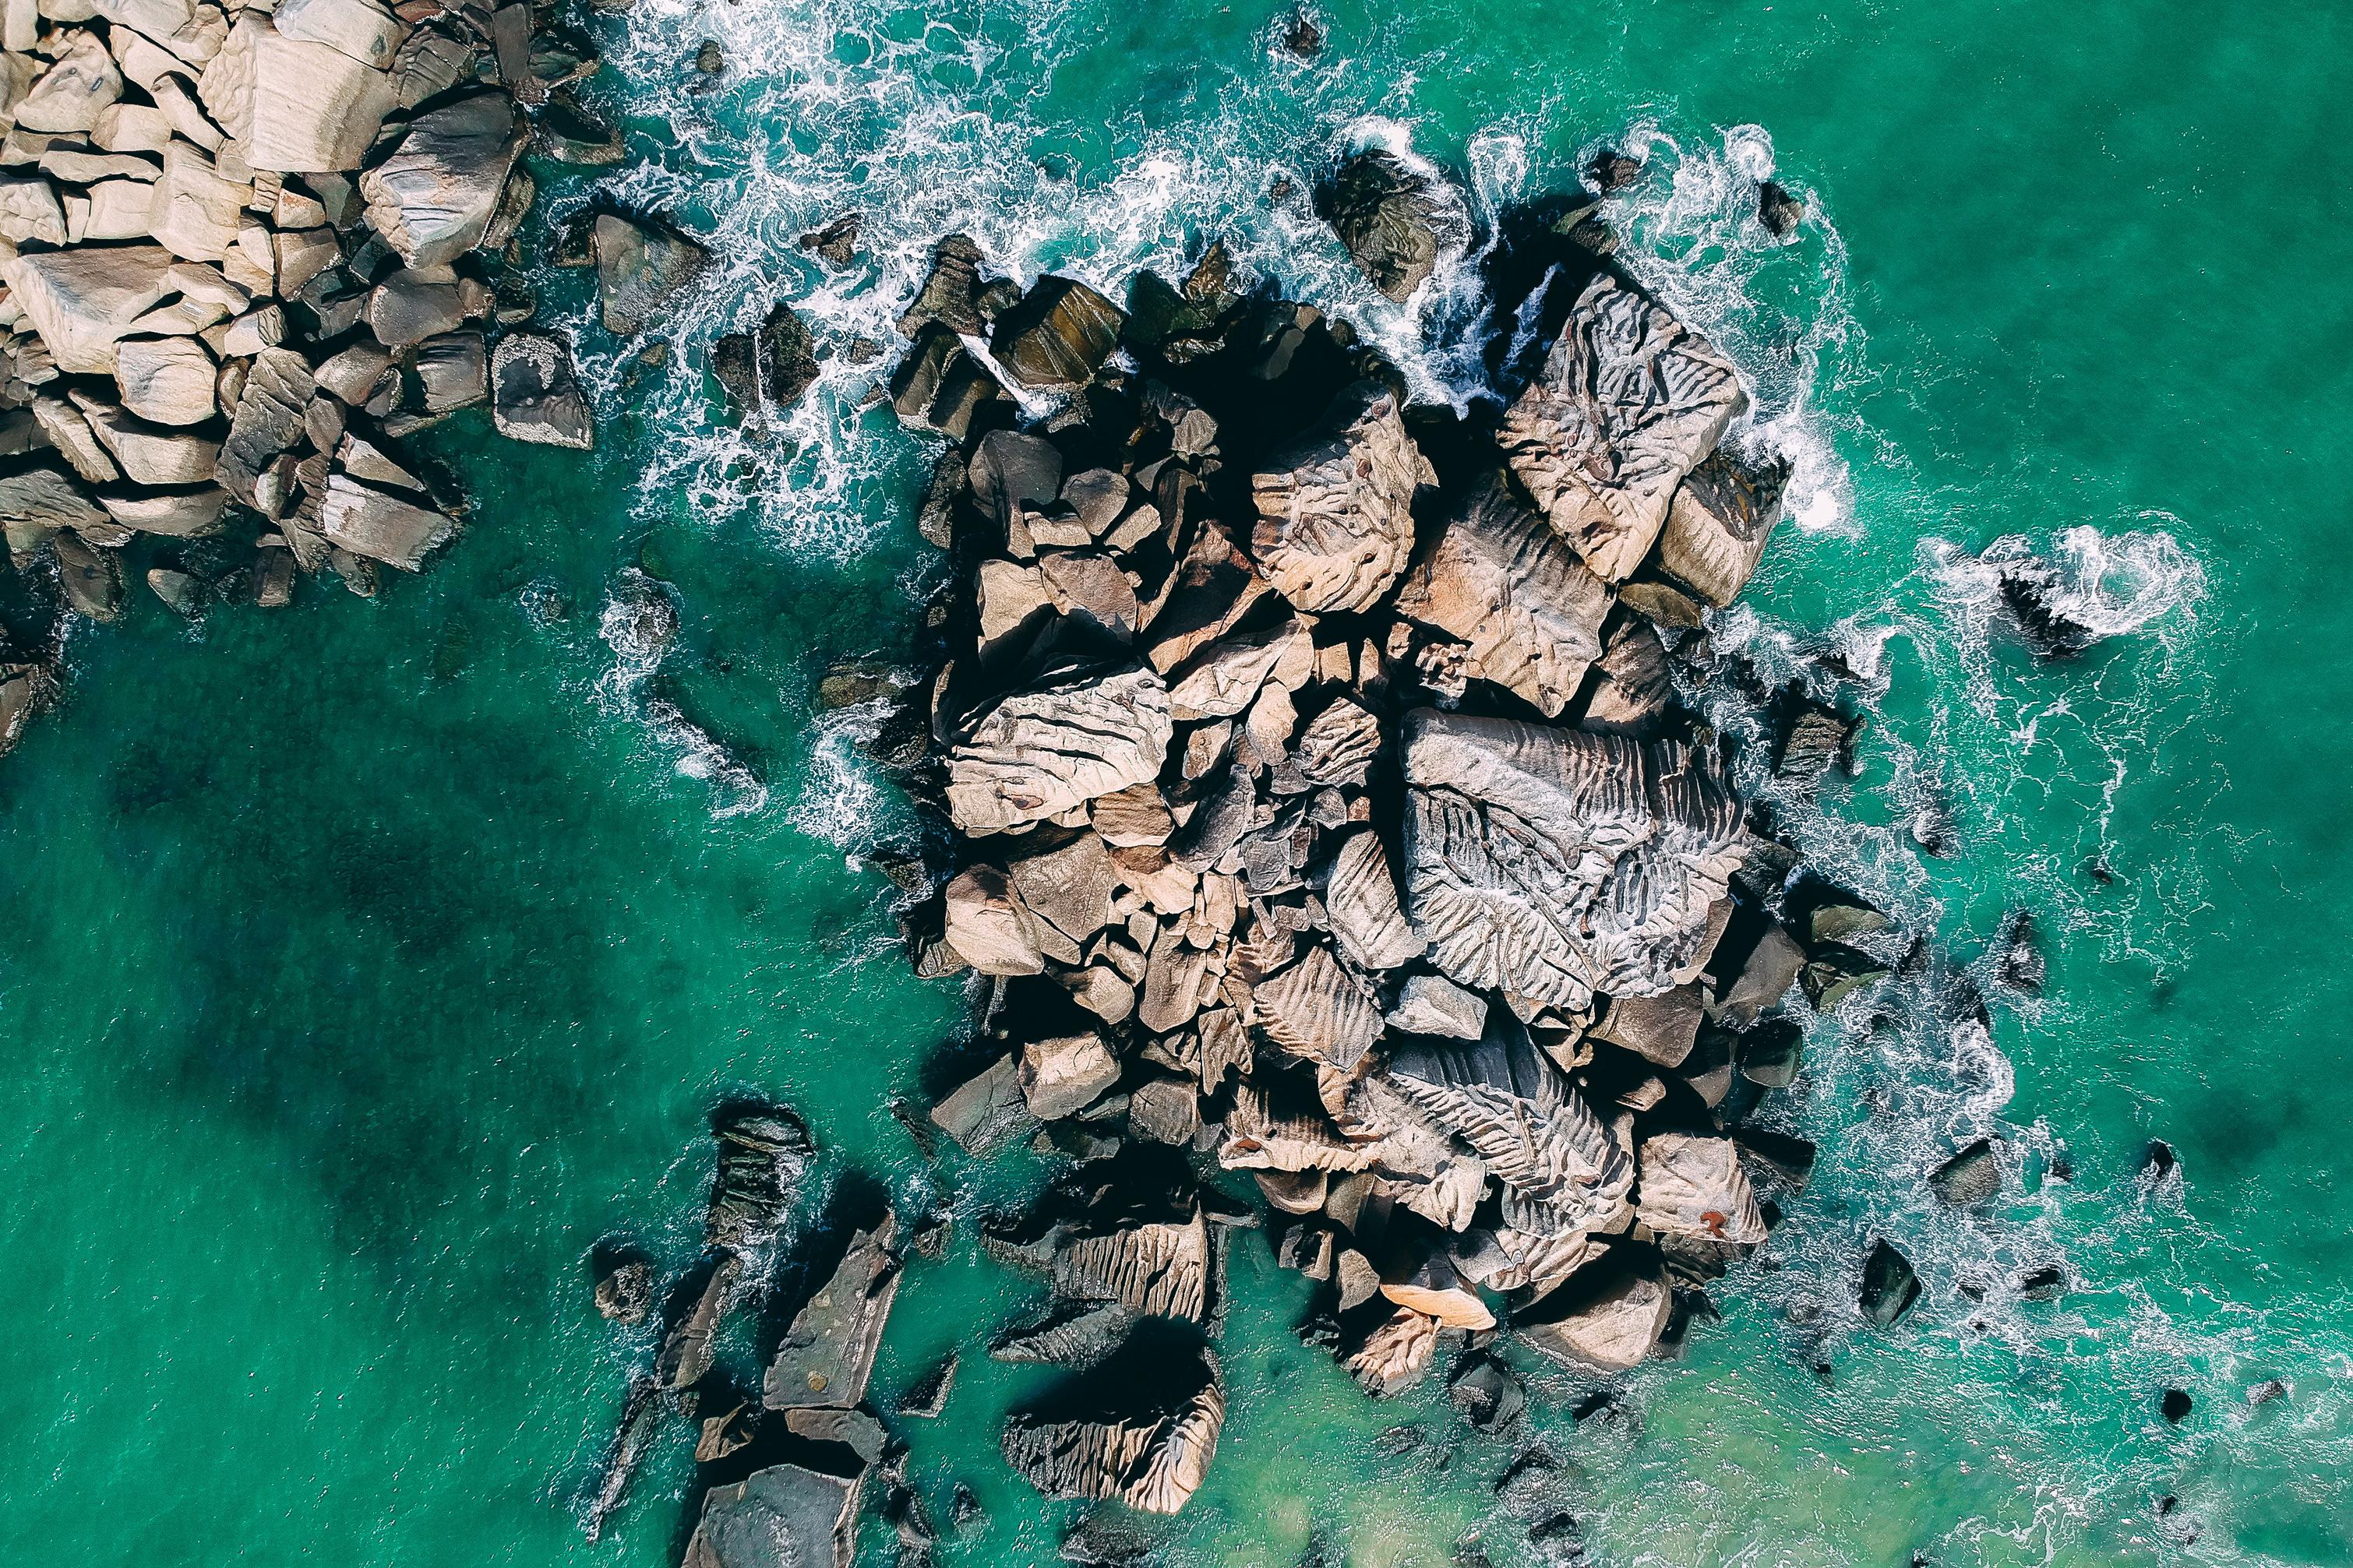 Aerial View of Seashore Rocks